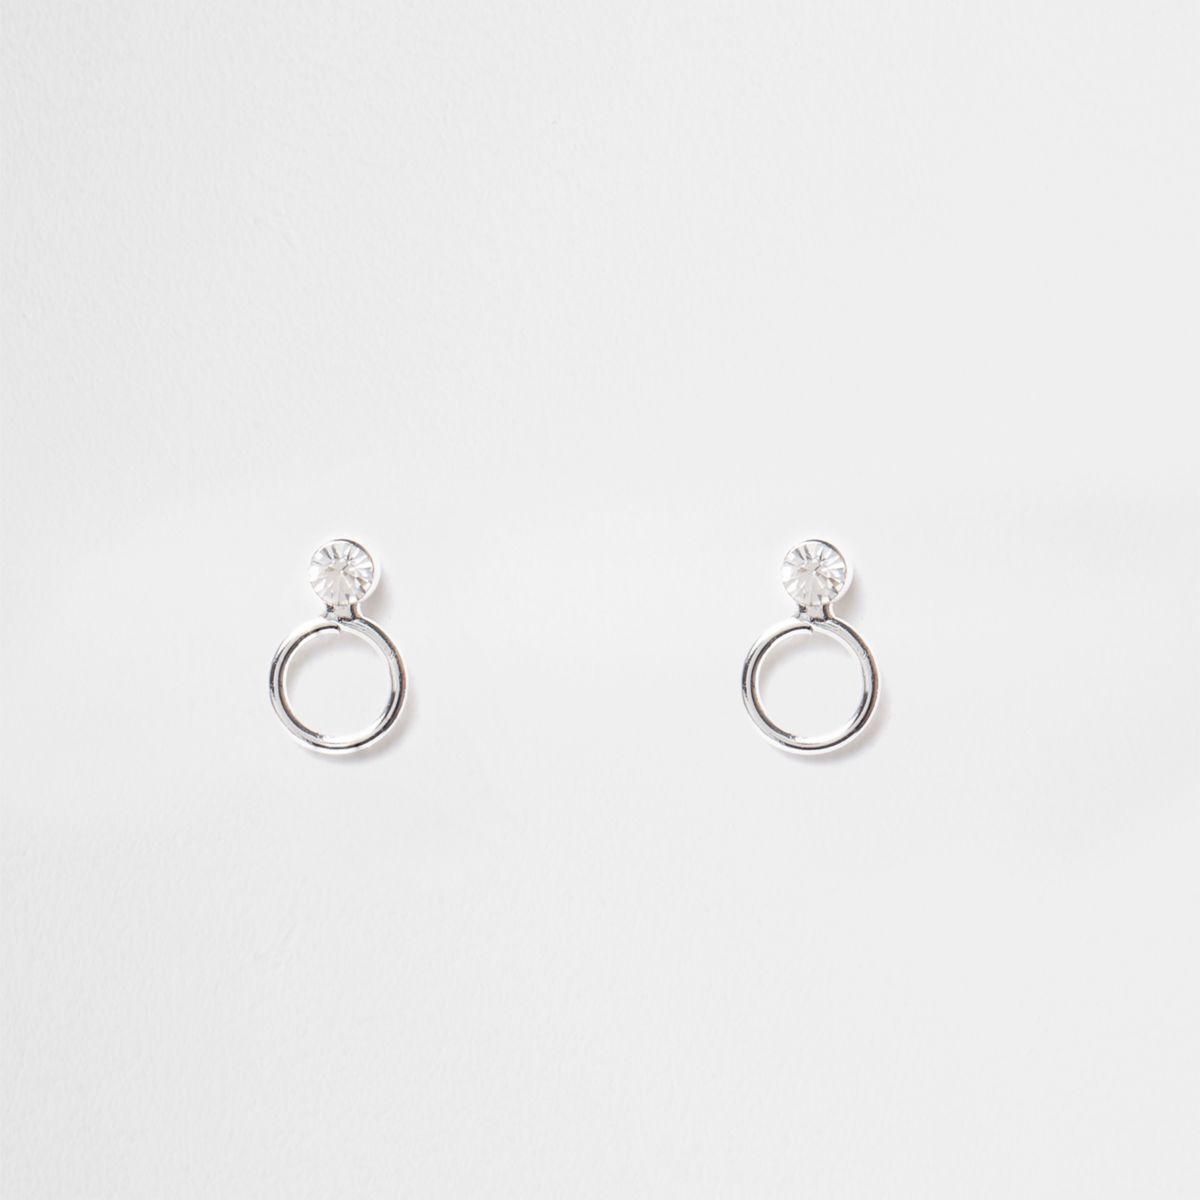 Silver tone rhinestone circle stud earrings